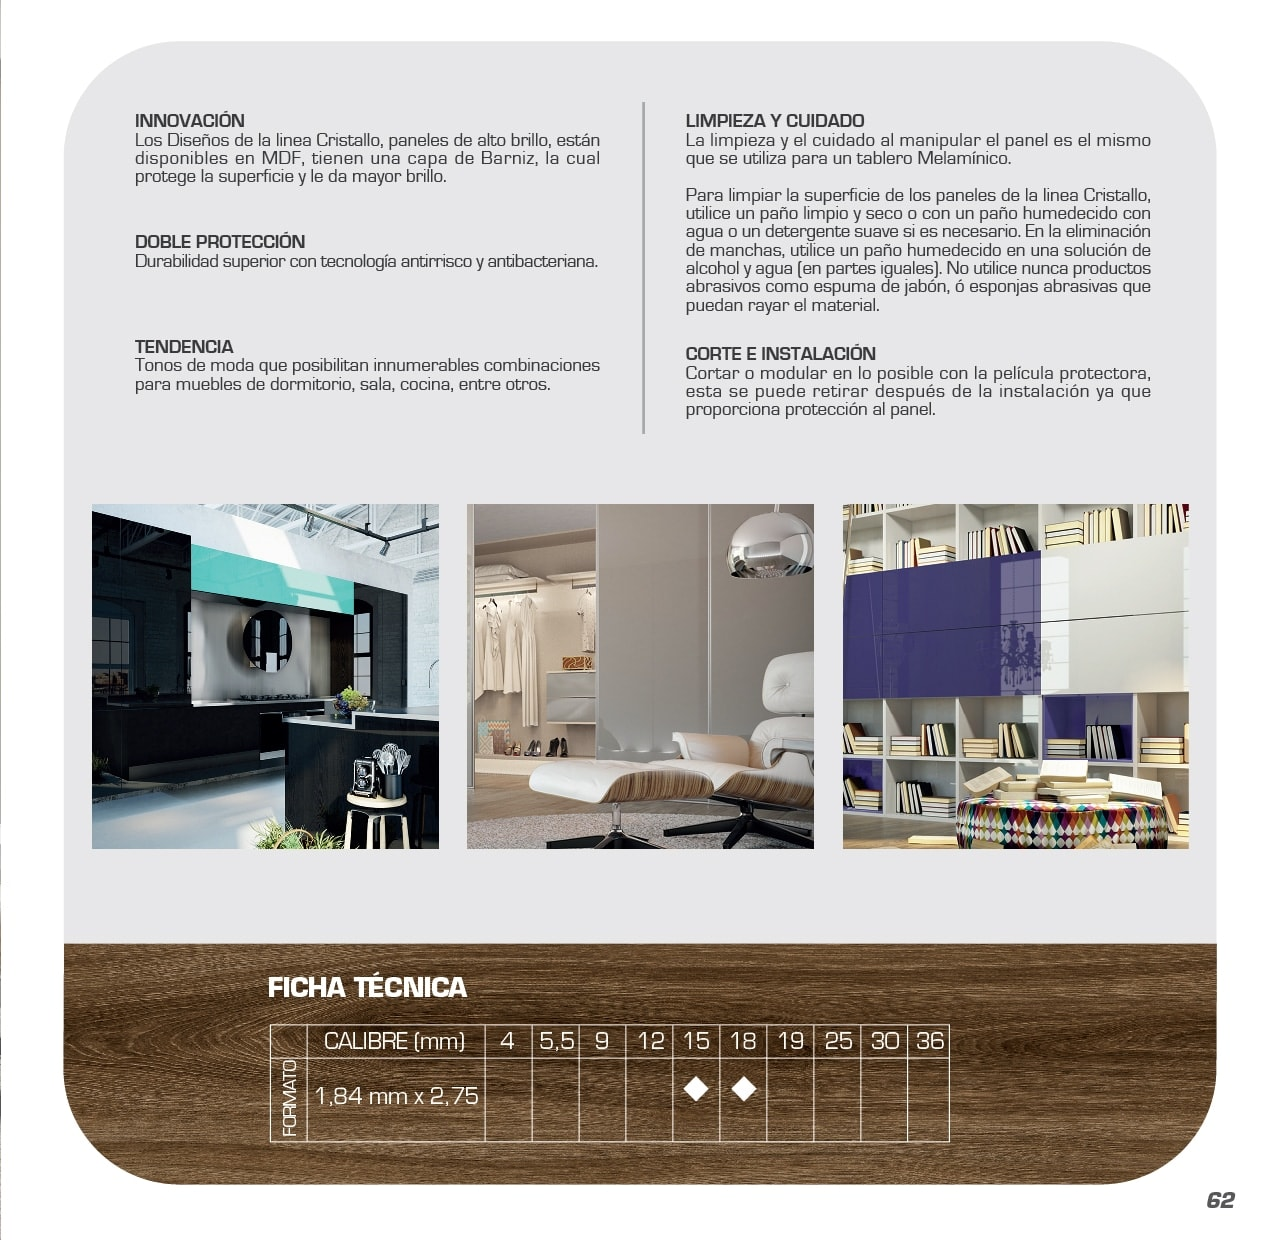 Catalogs Tablemac Cat Logo De Productos 2016 # Muebles Tablemac